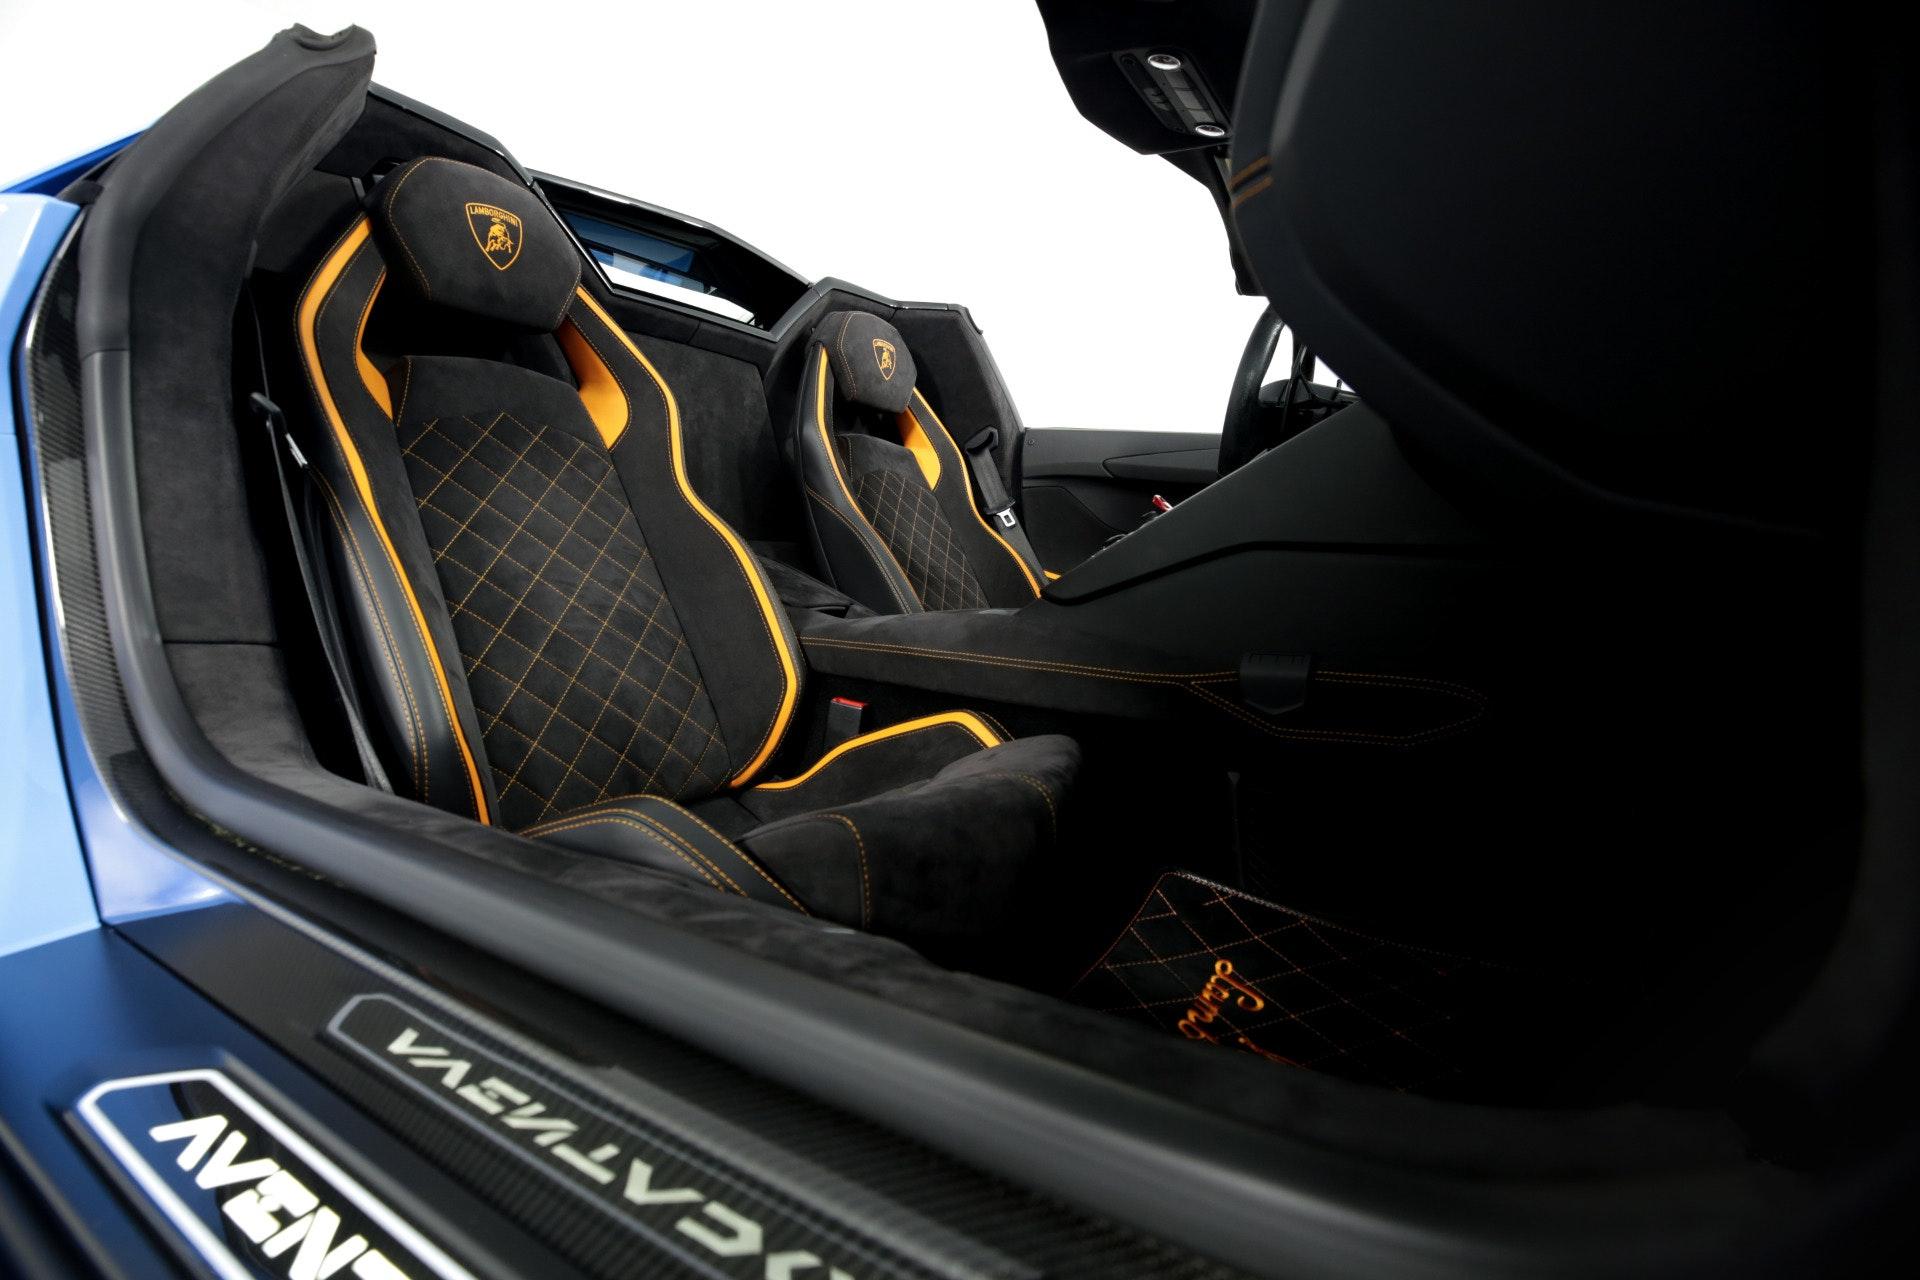 Miami Lamborghini Aventador Spider image #2